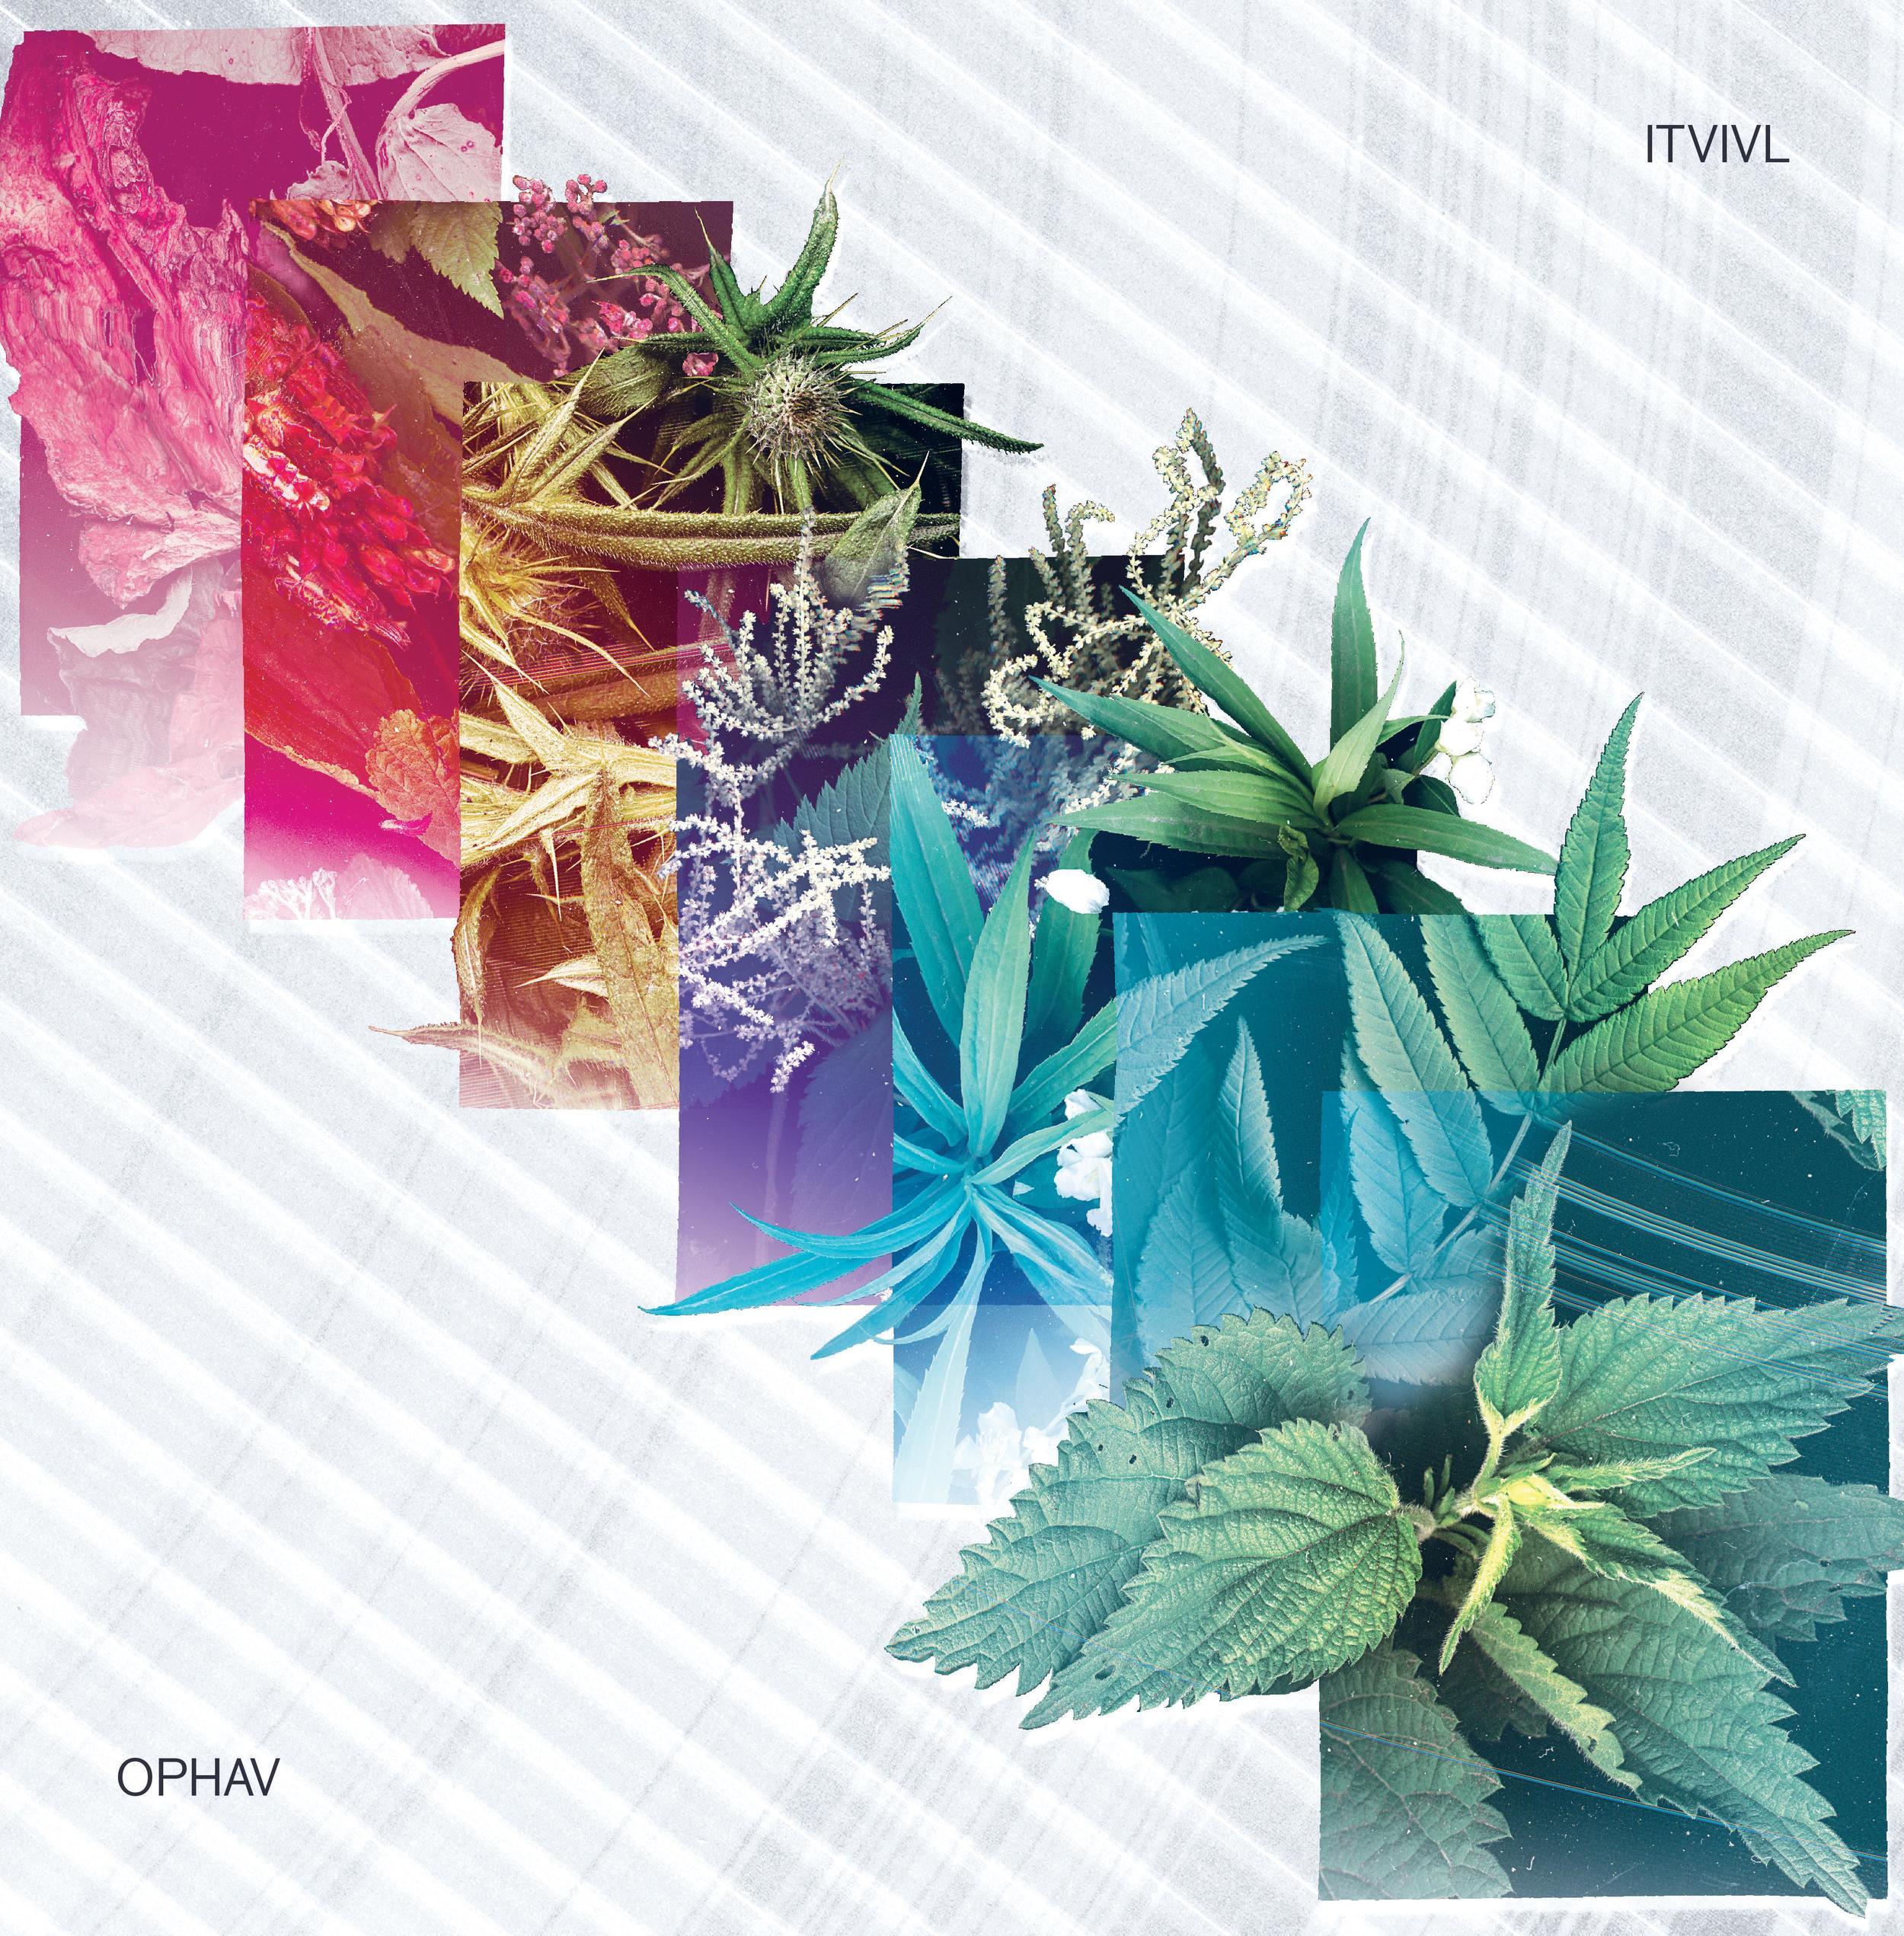 Itivl: Ophav